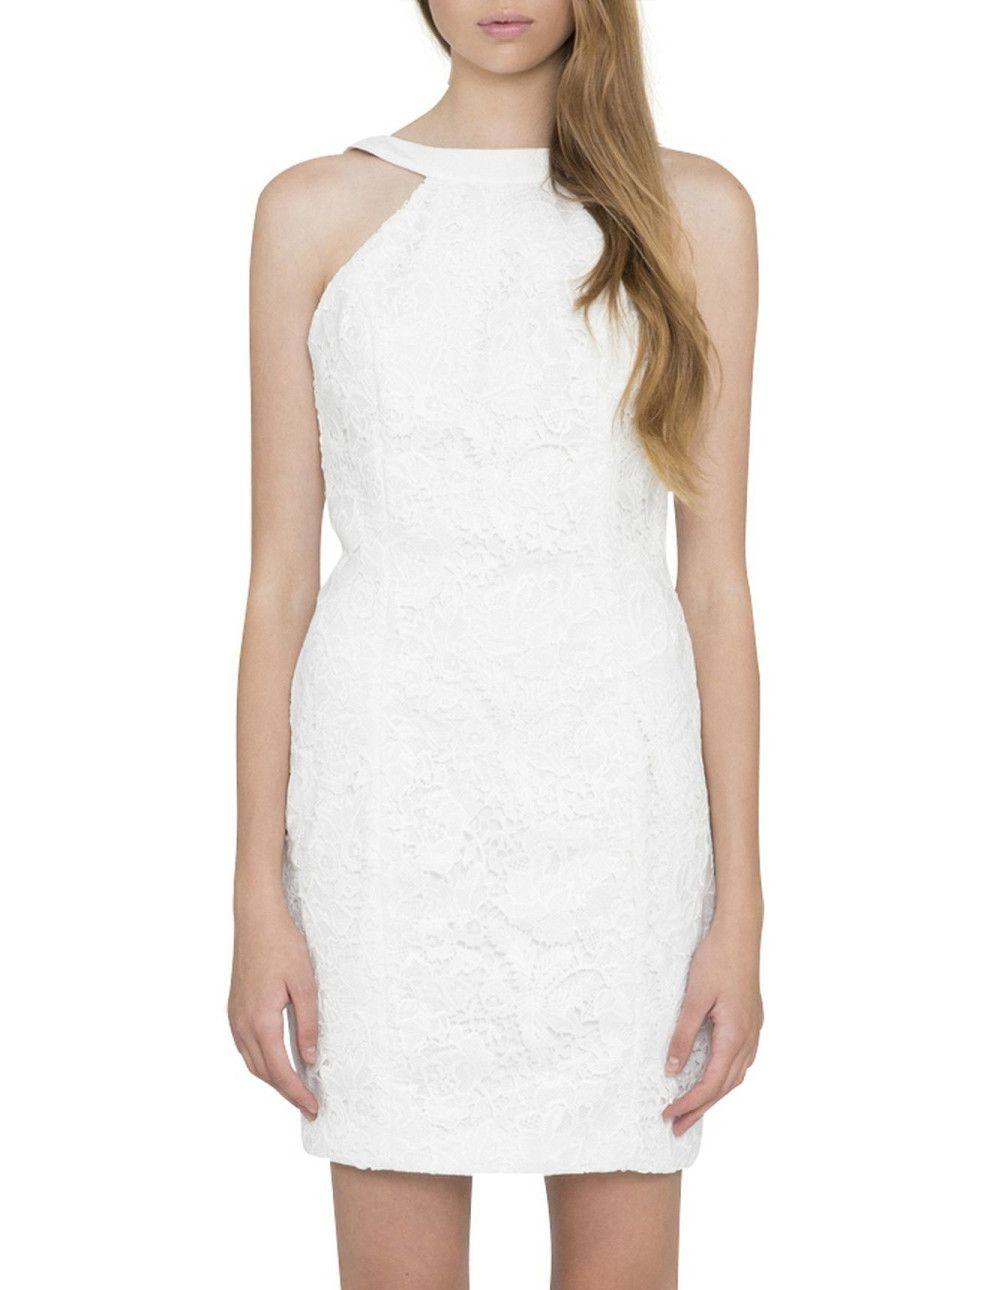 White dress david jones - Take It All High Neck Dress David Jones